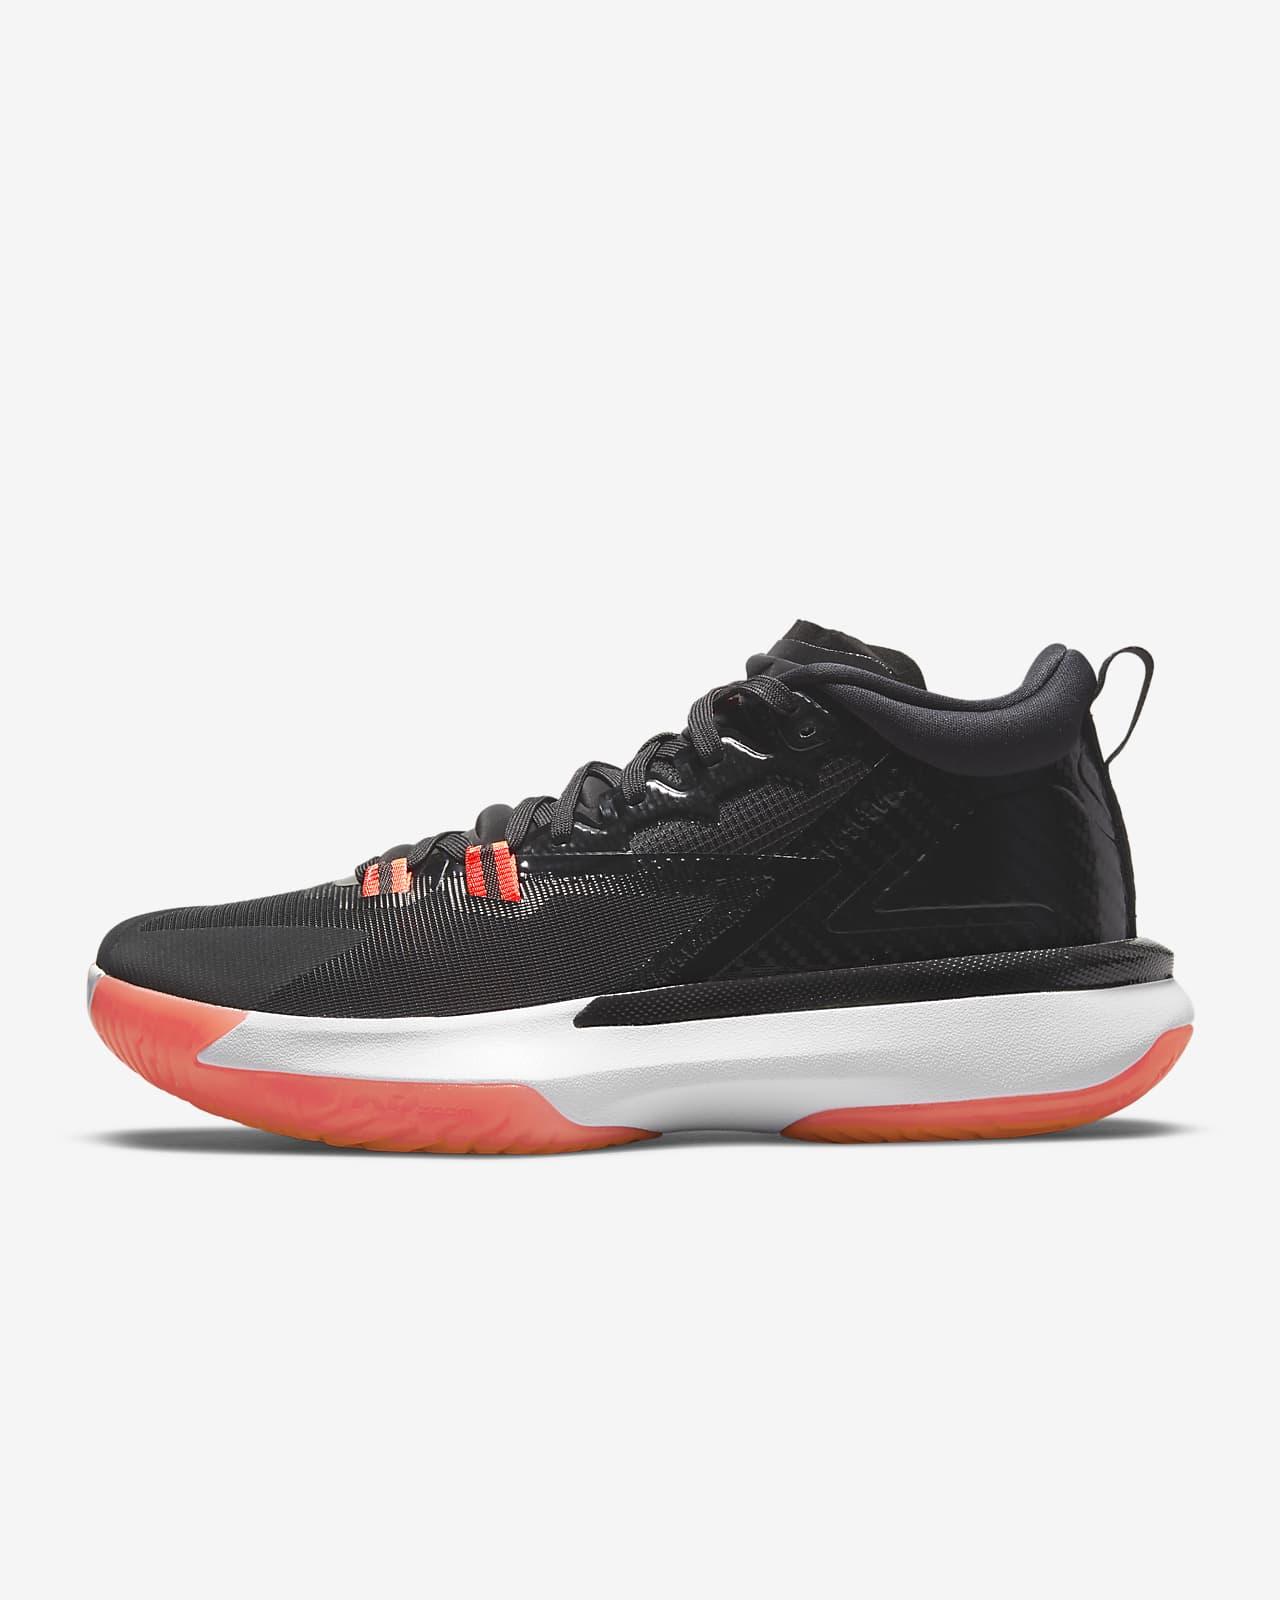 Jordan Zion 1 PF 男子篮球鞋